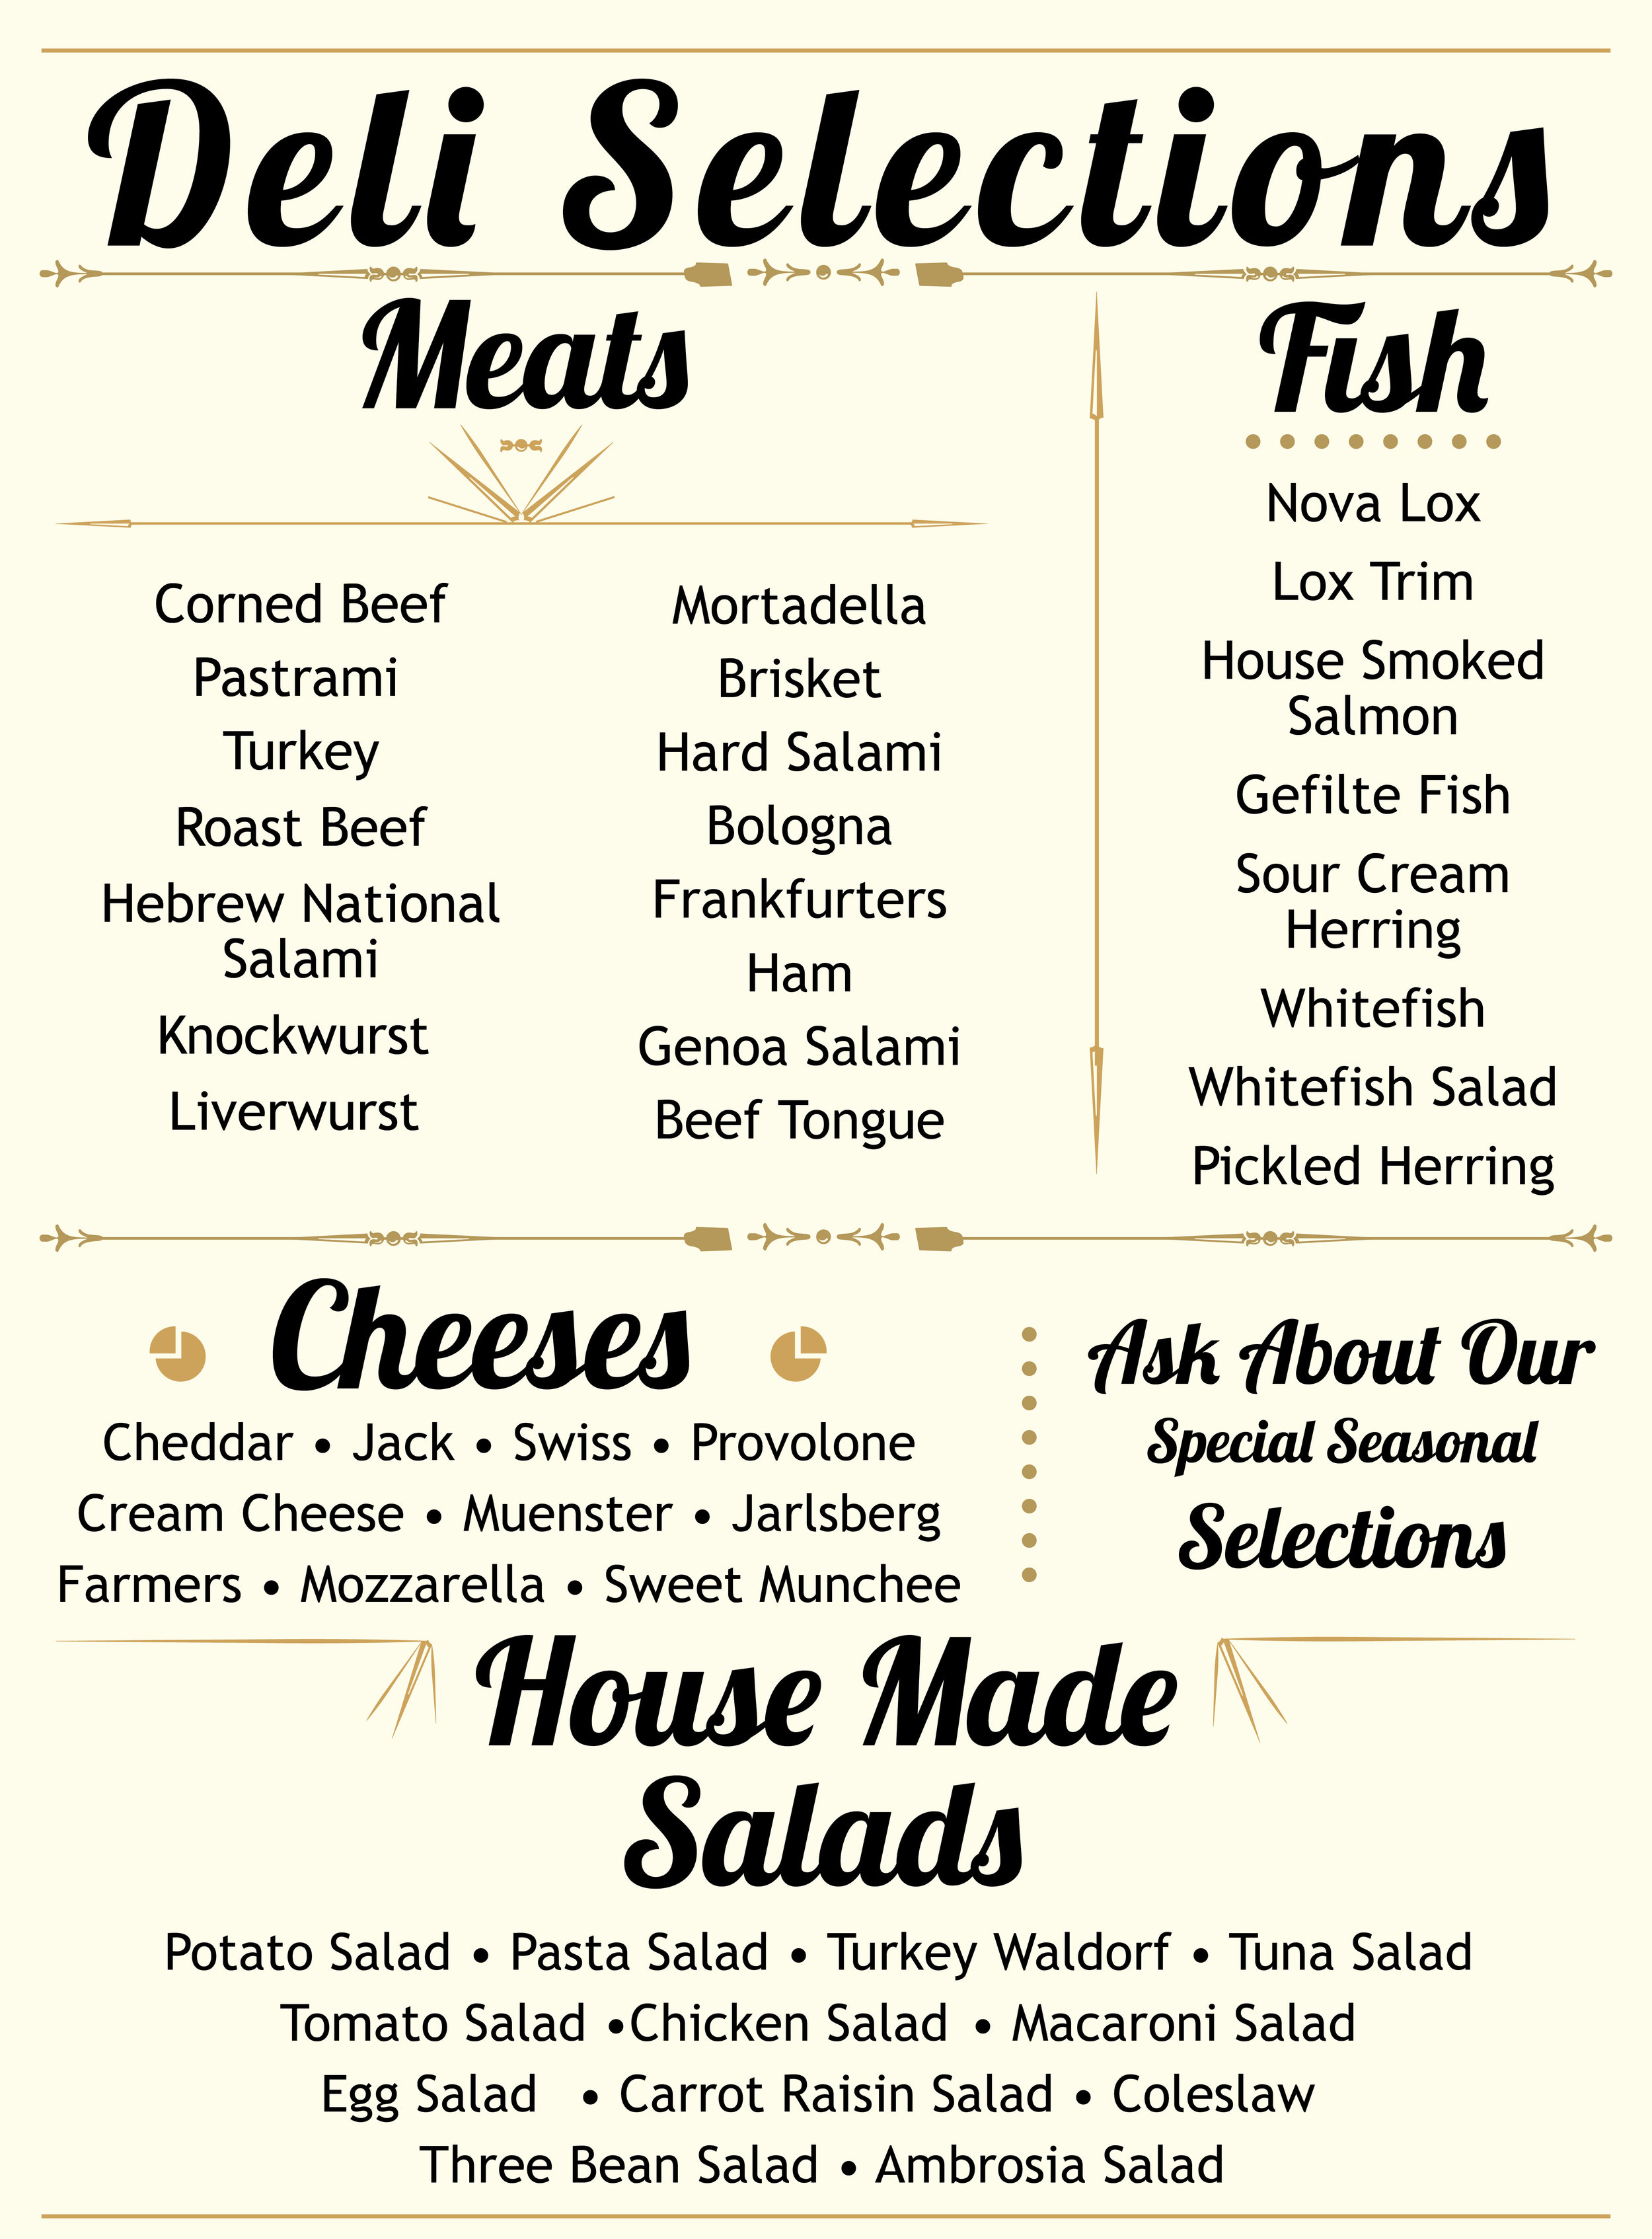 katella_deli_menu_board-01.jpg